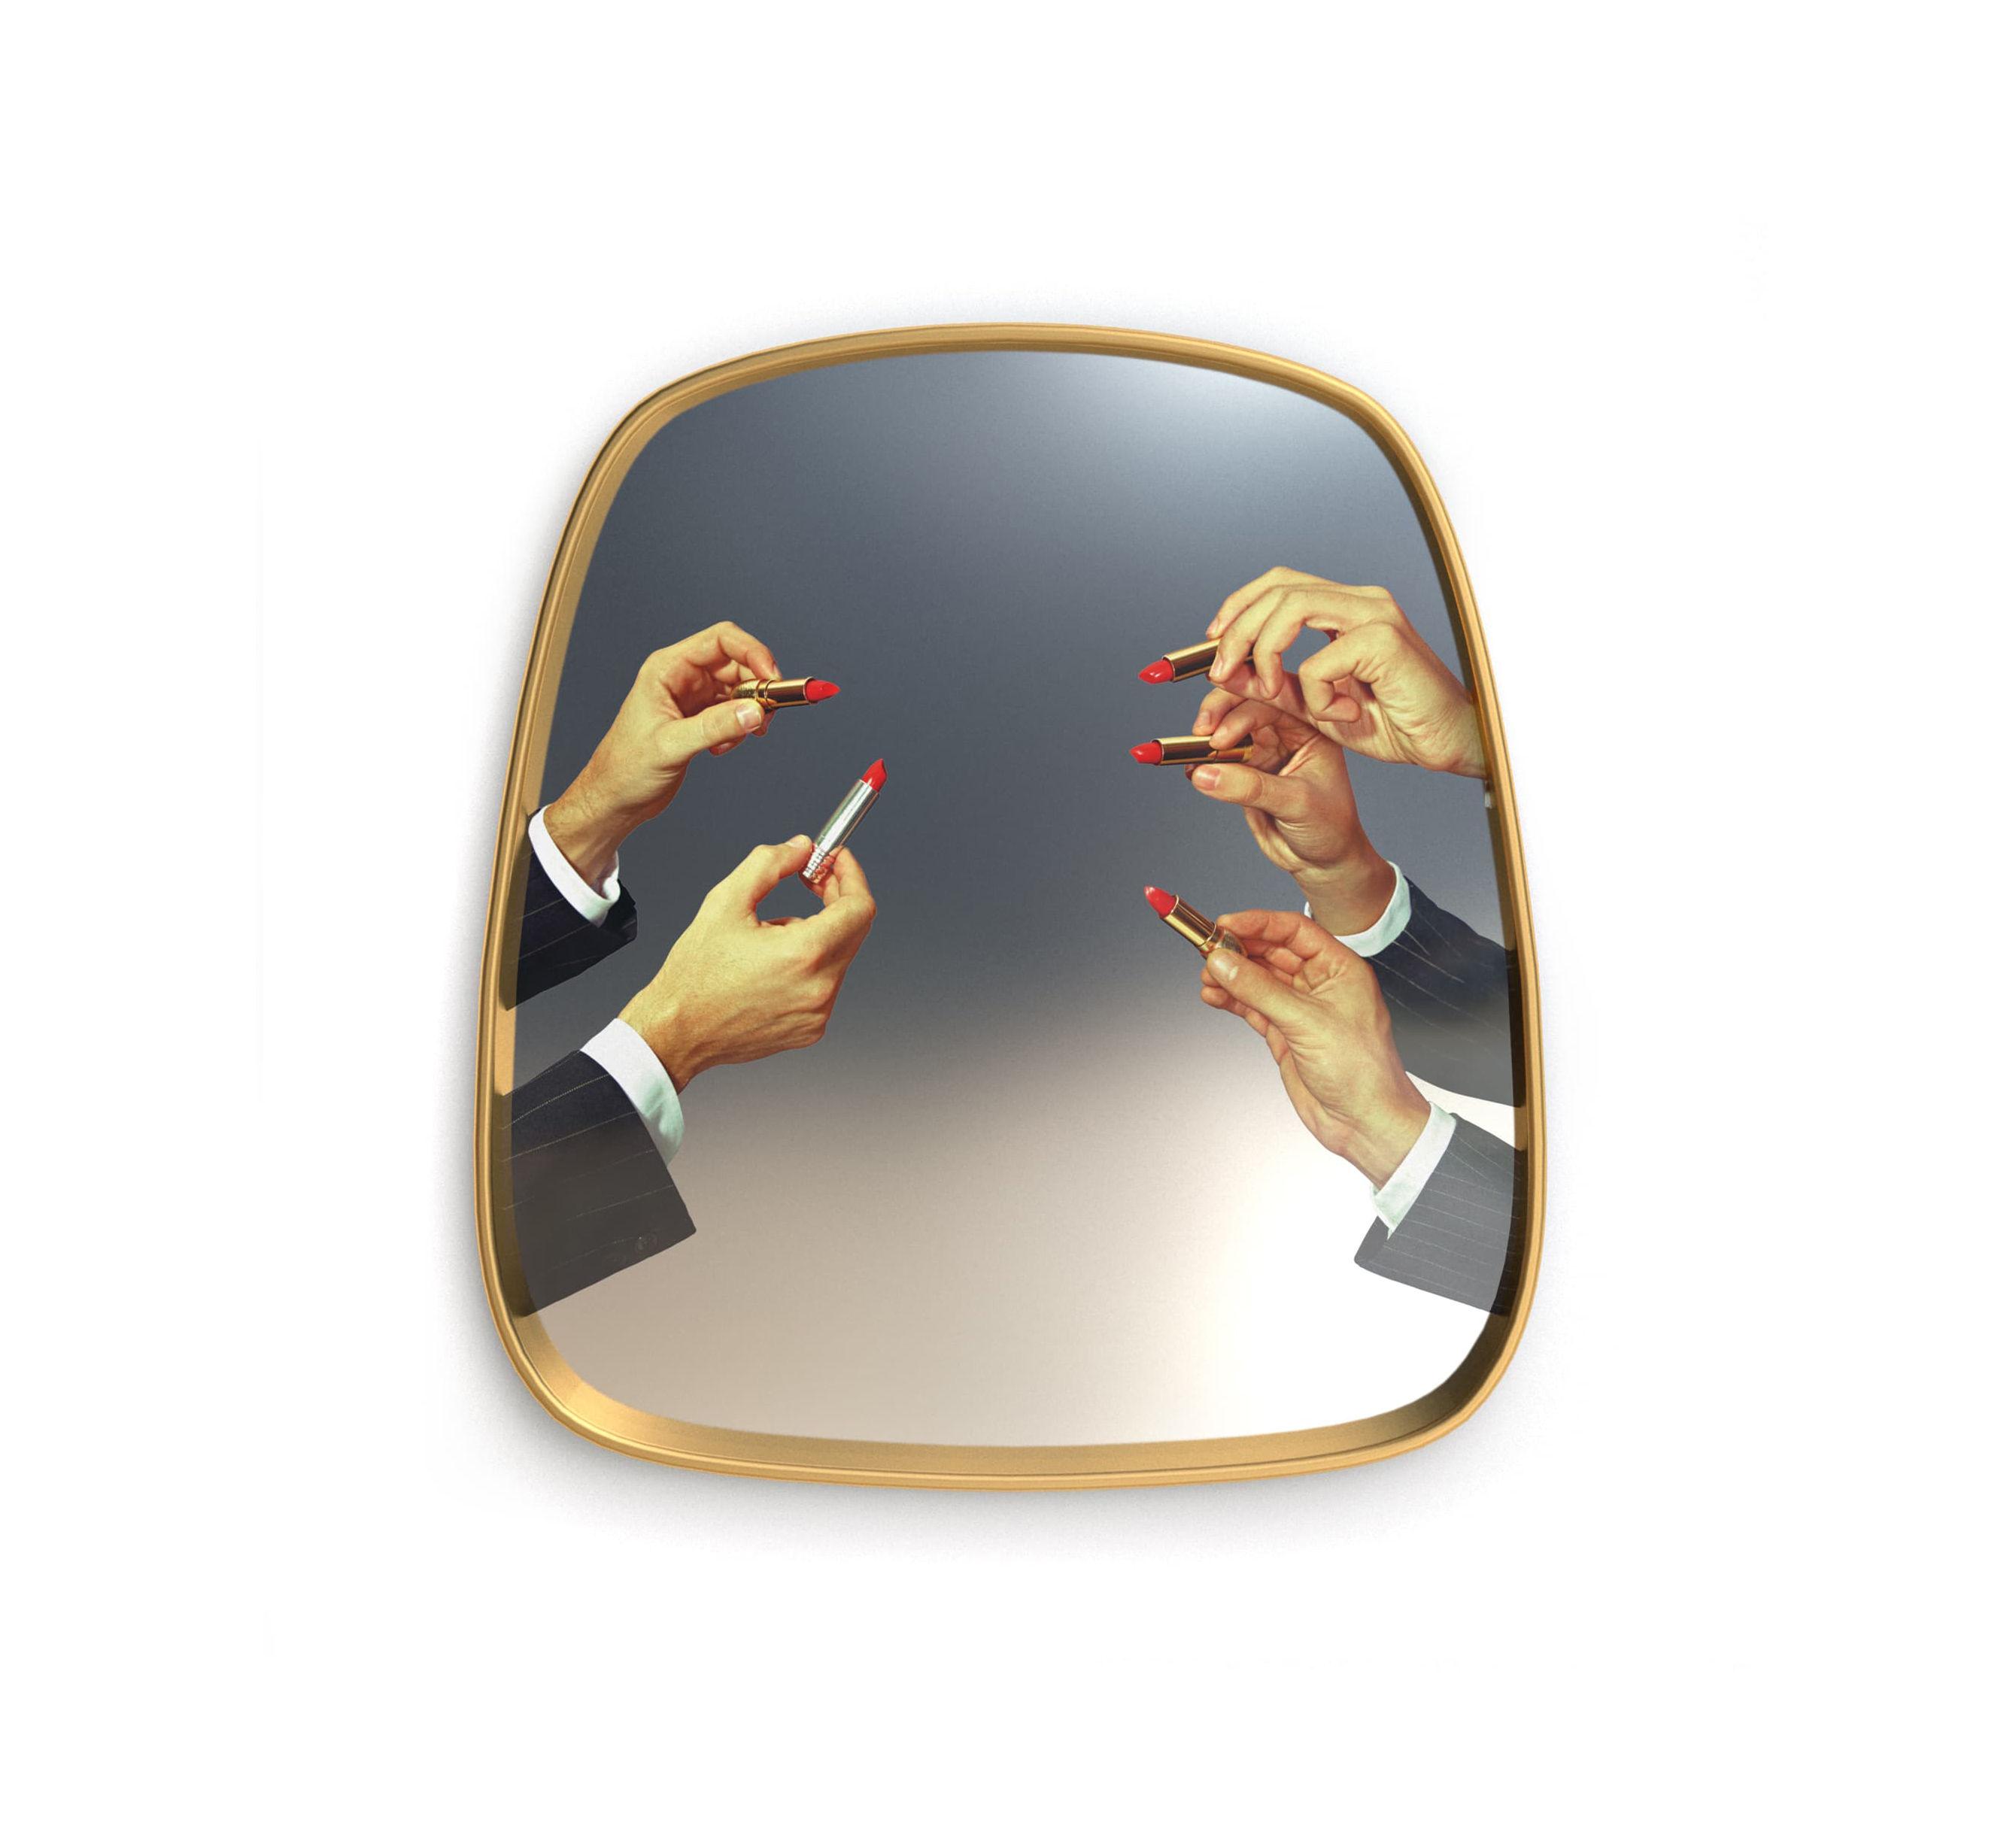 Decoration - Mirrors - Toiletpaper Mirror - / Lipsticks - 54 x 59 cm by Seletti - Lipsticks / Brass frame - Brass, Glass, MDF